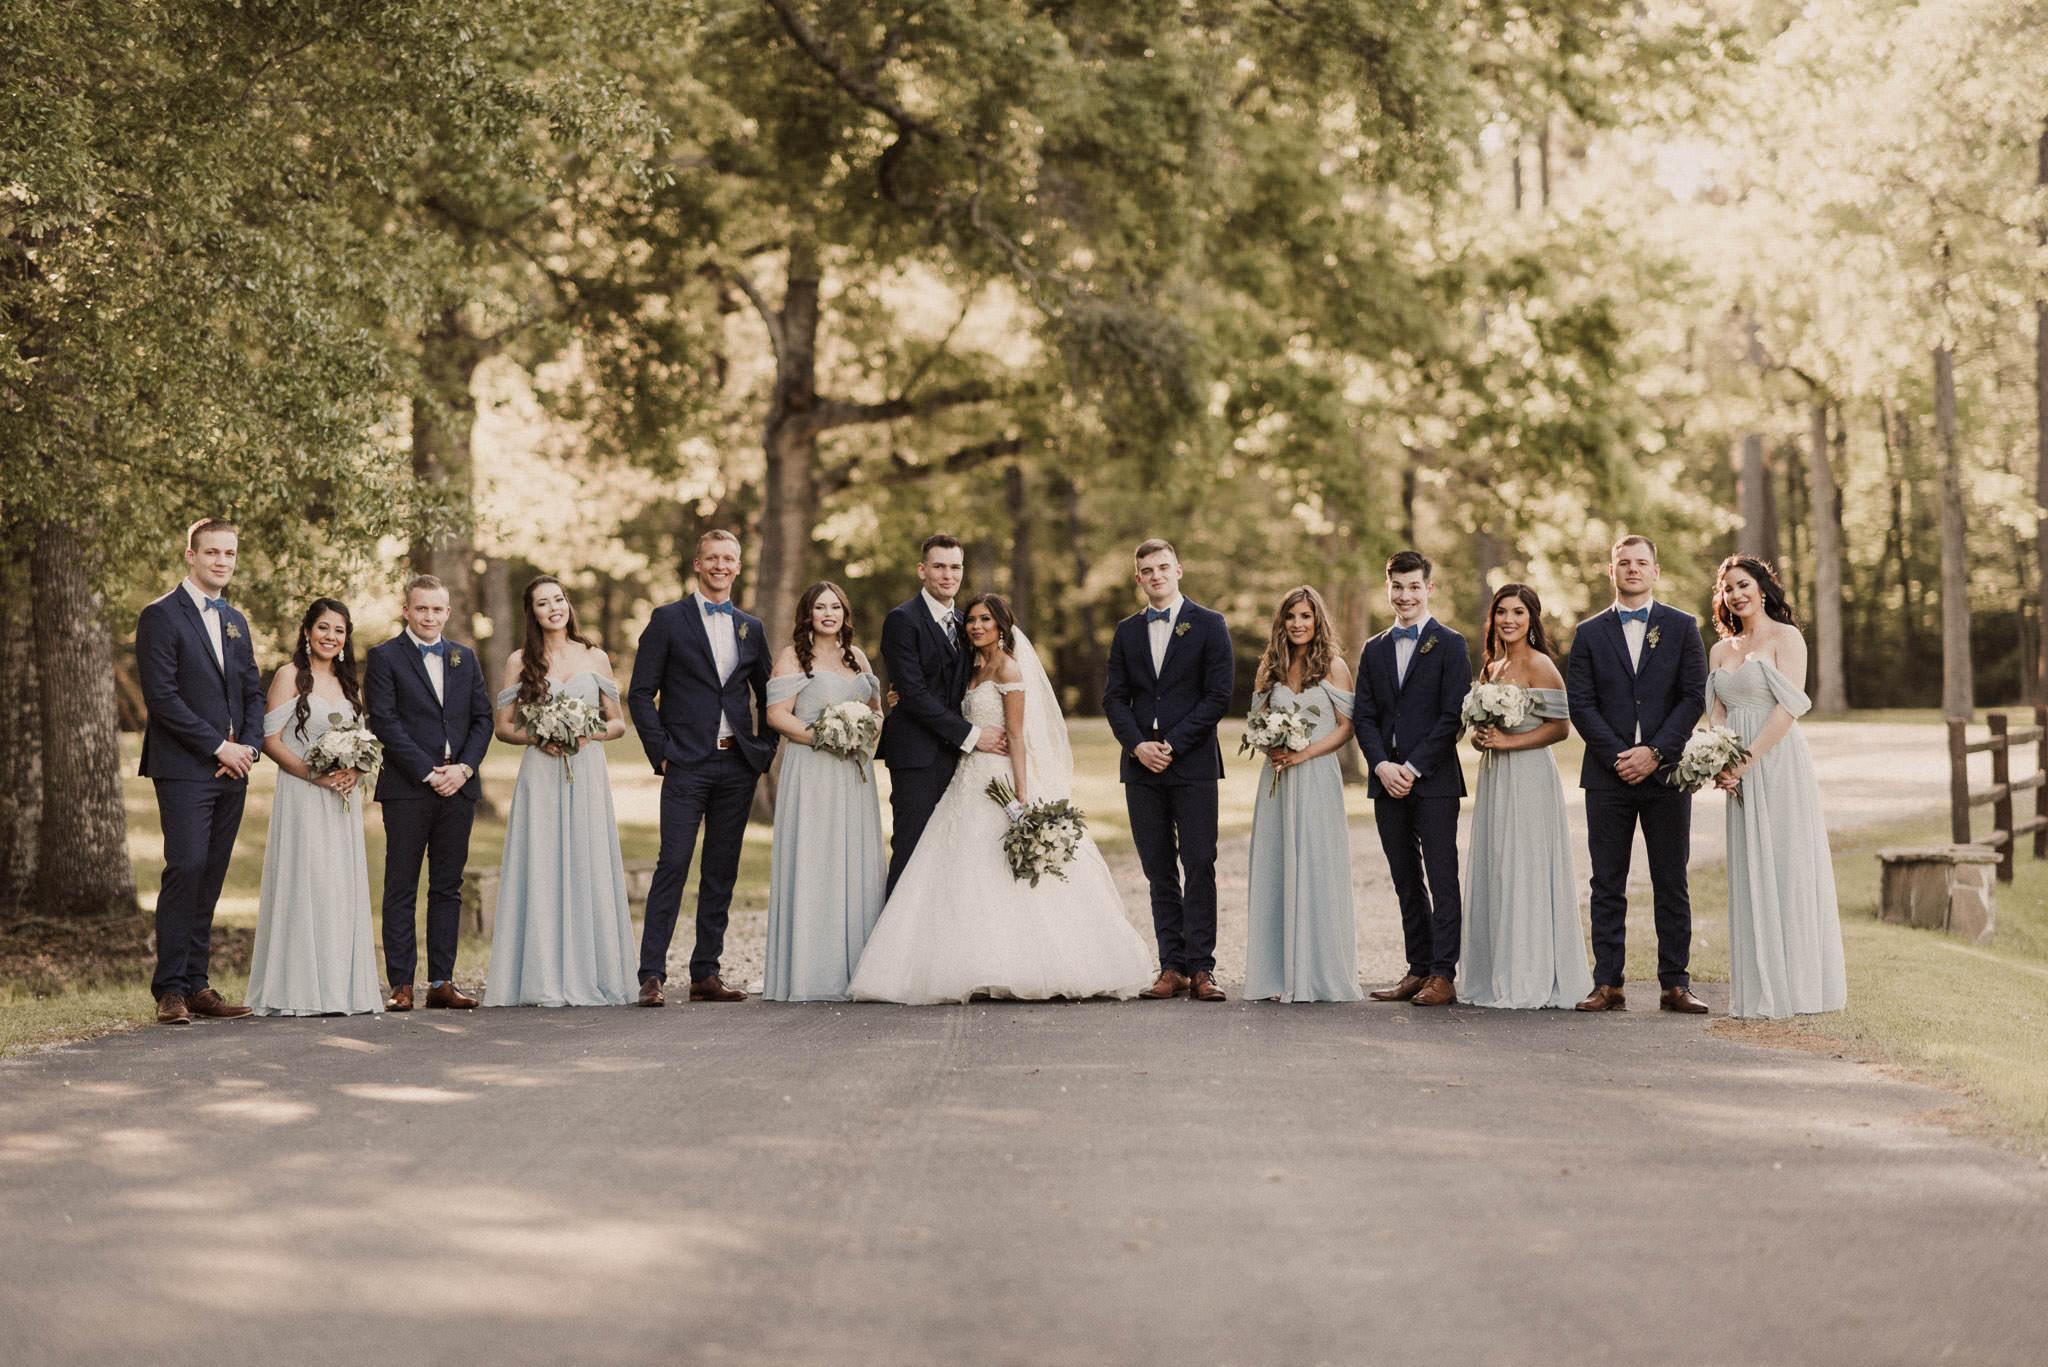 adriana-christian-wedding-re-sm-95.jpg